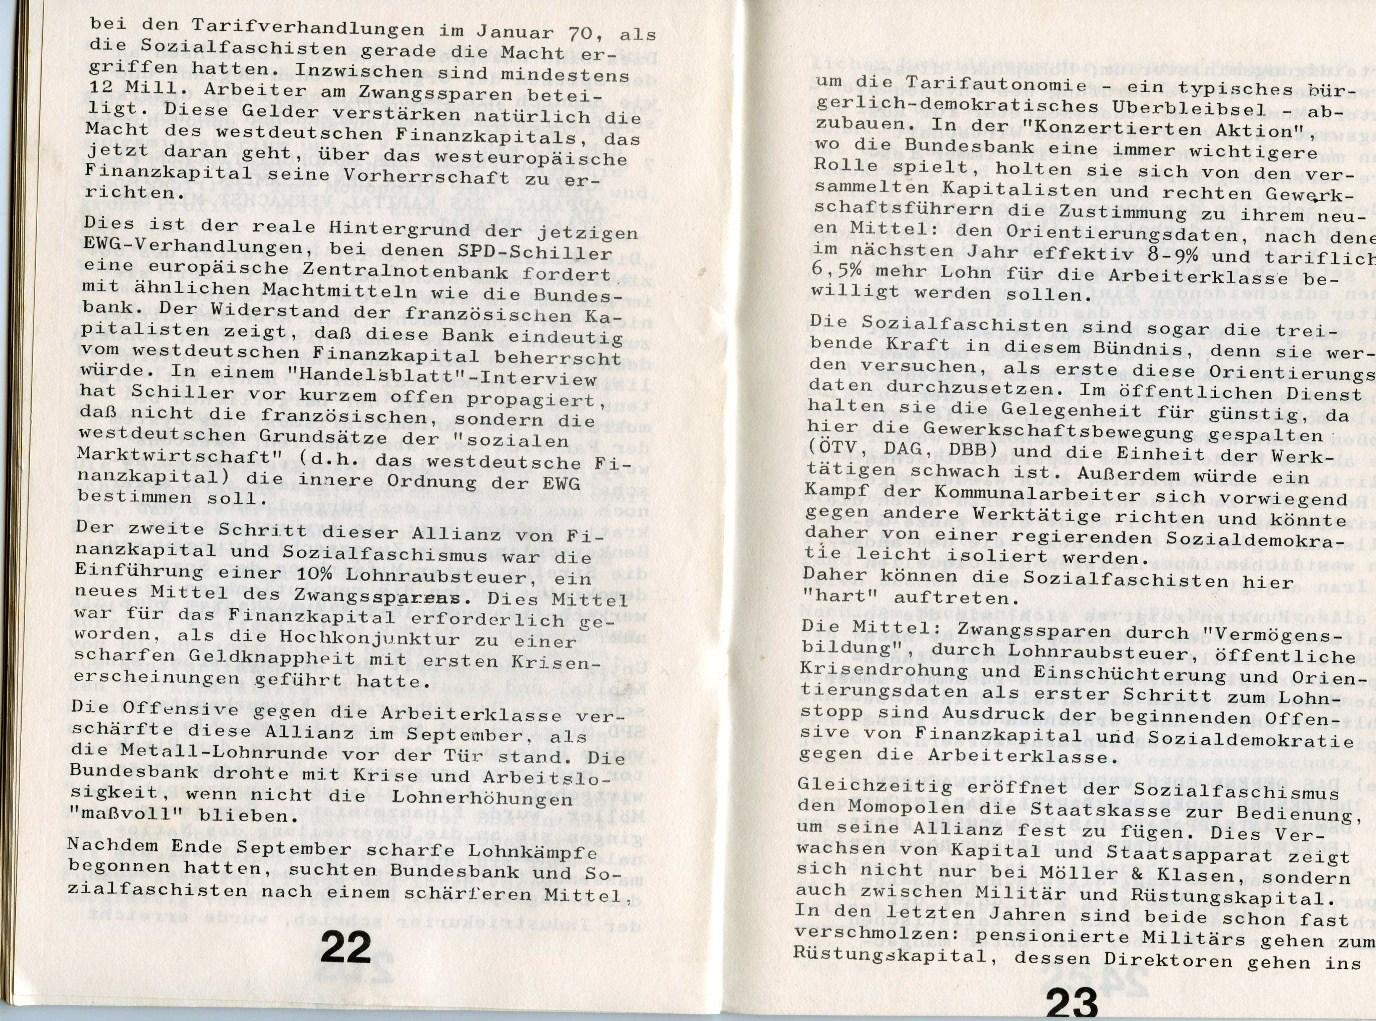 KJVD_Sozialdemokratie_Sozialfaschismus_1971_13